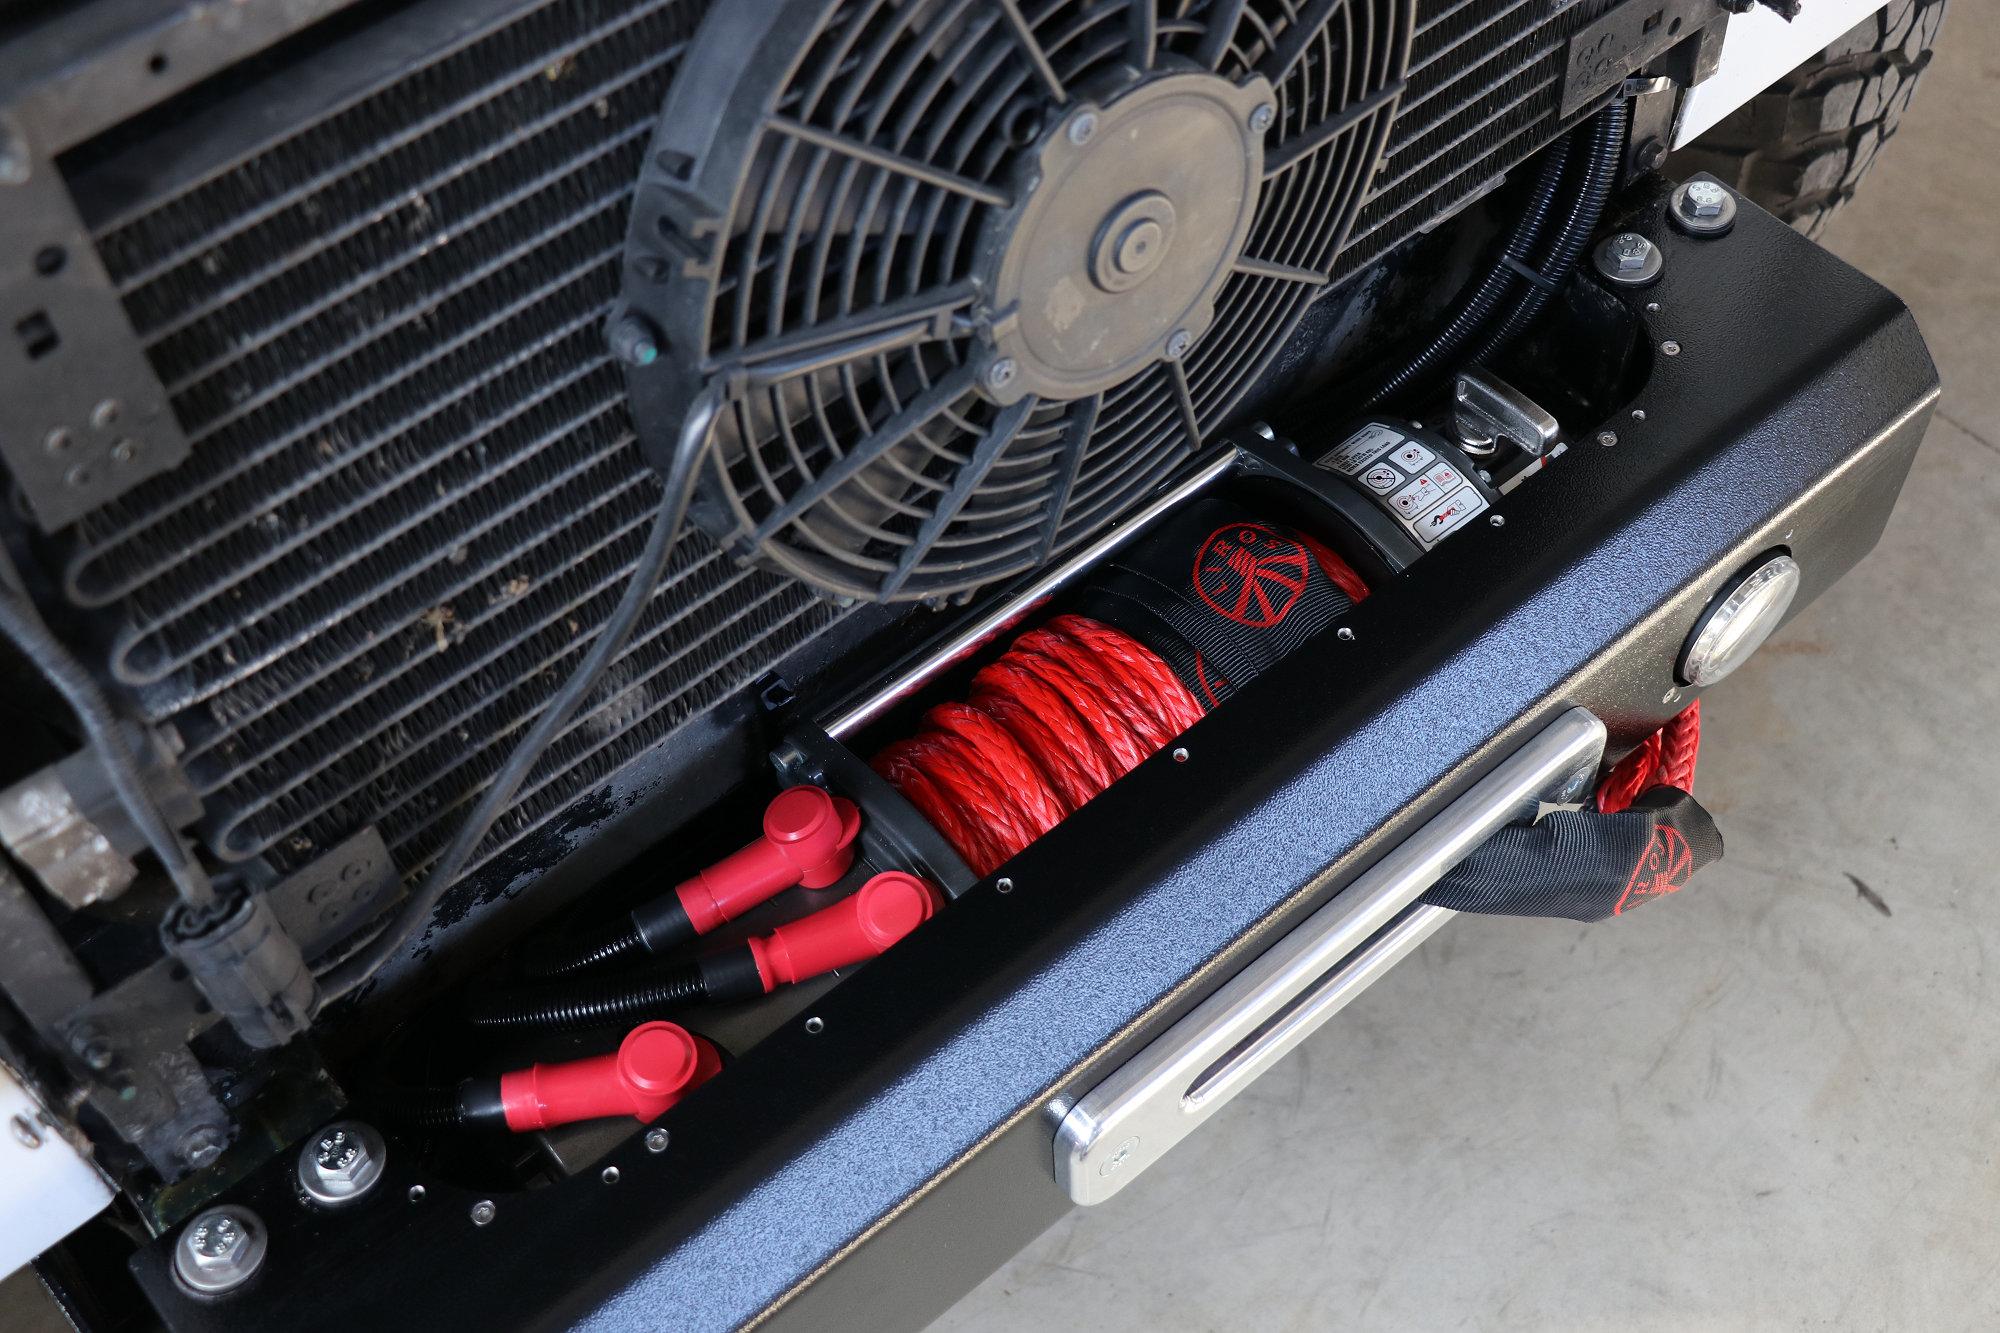 Seilwindenstossstange Land Rover Defender.002